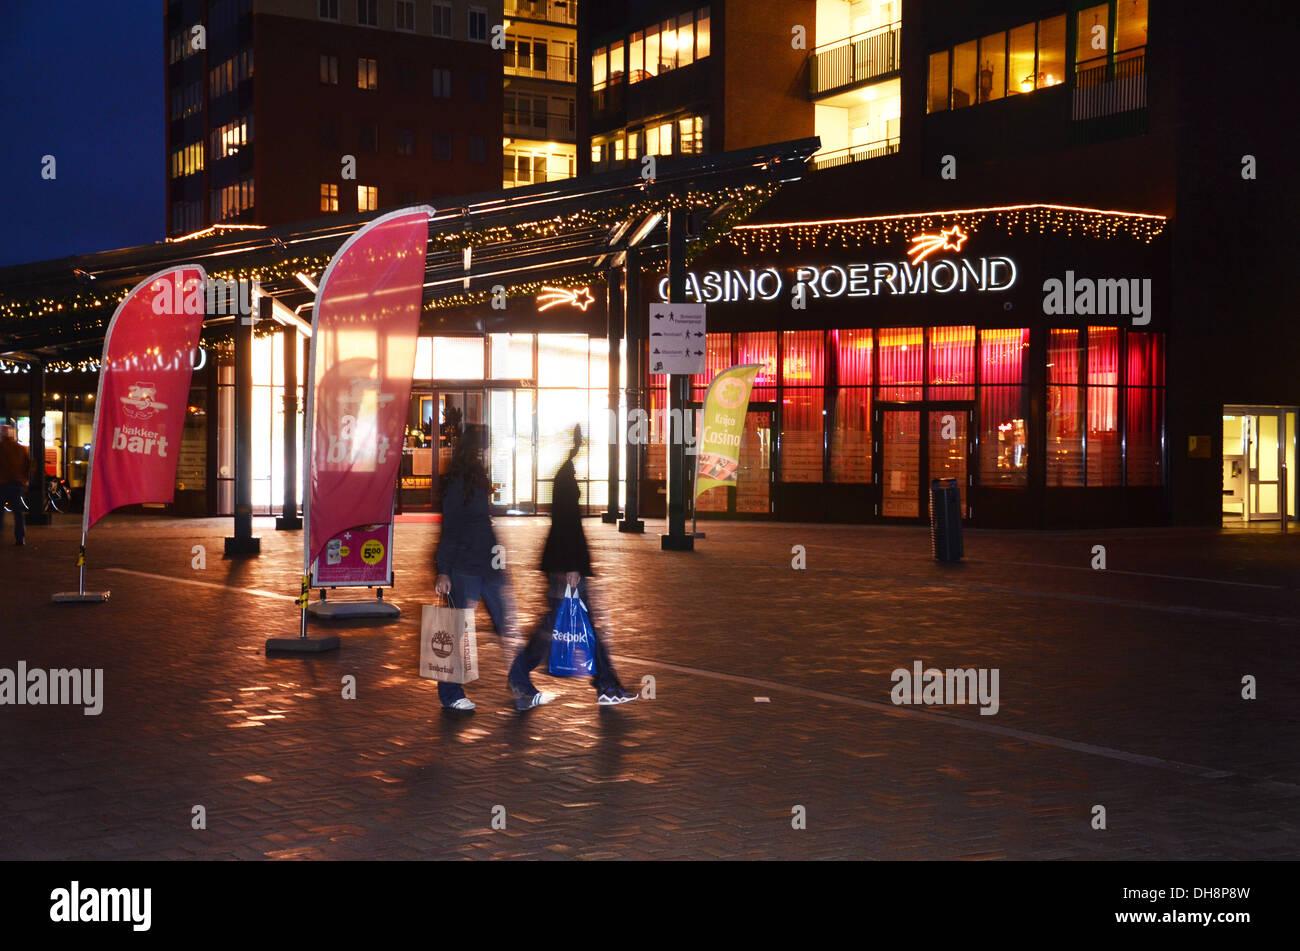 Casino Roermond Netherlands Stock Photo